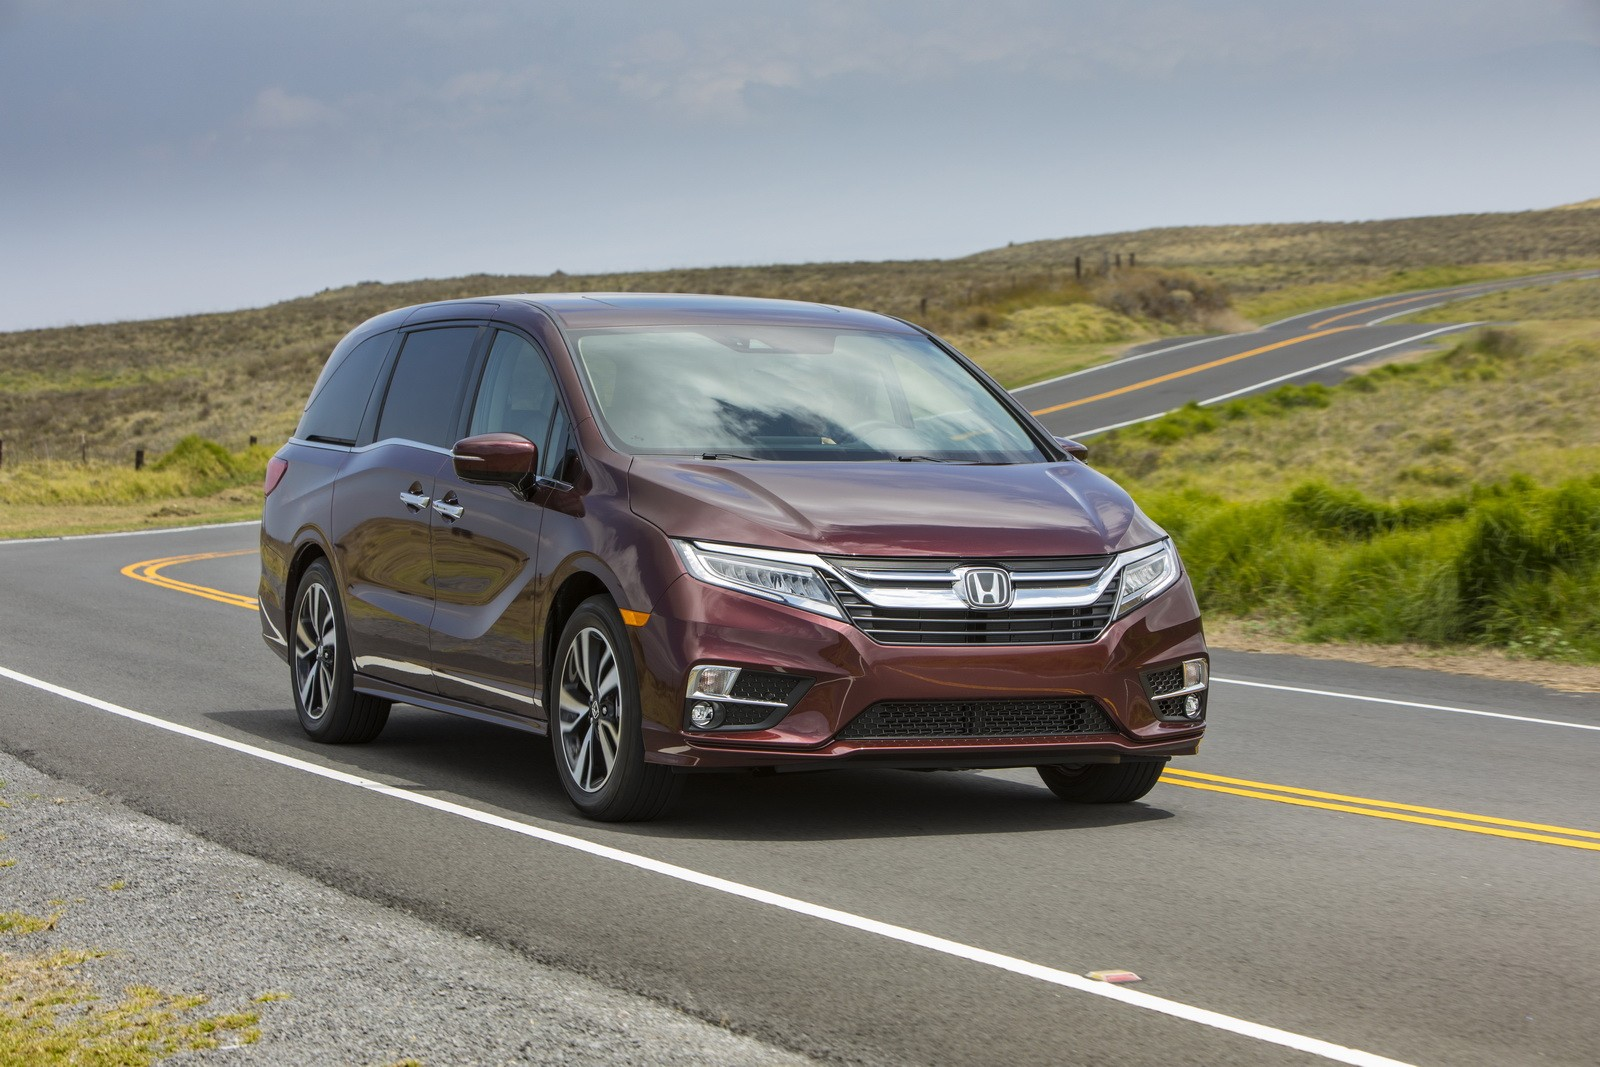 Minivan For Sale >> 2018 Honda Odyssey Goes on Sale Starting at $29,990 - autoevolution